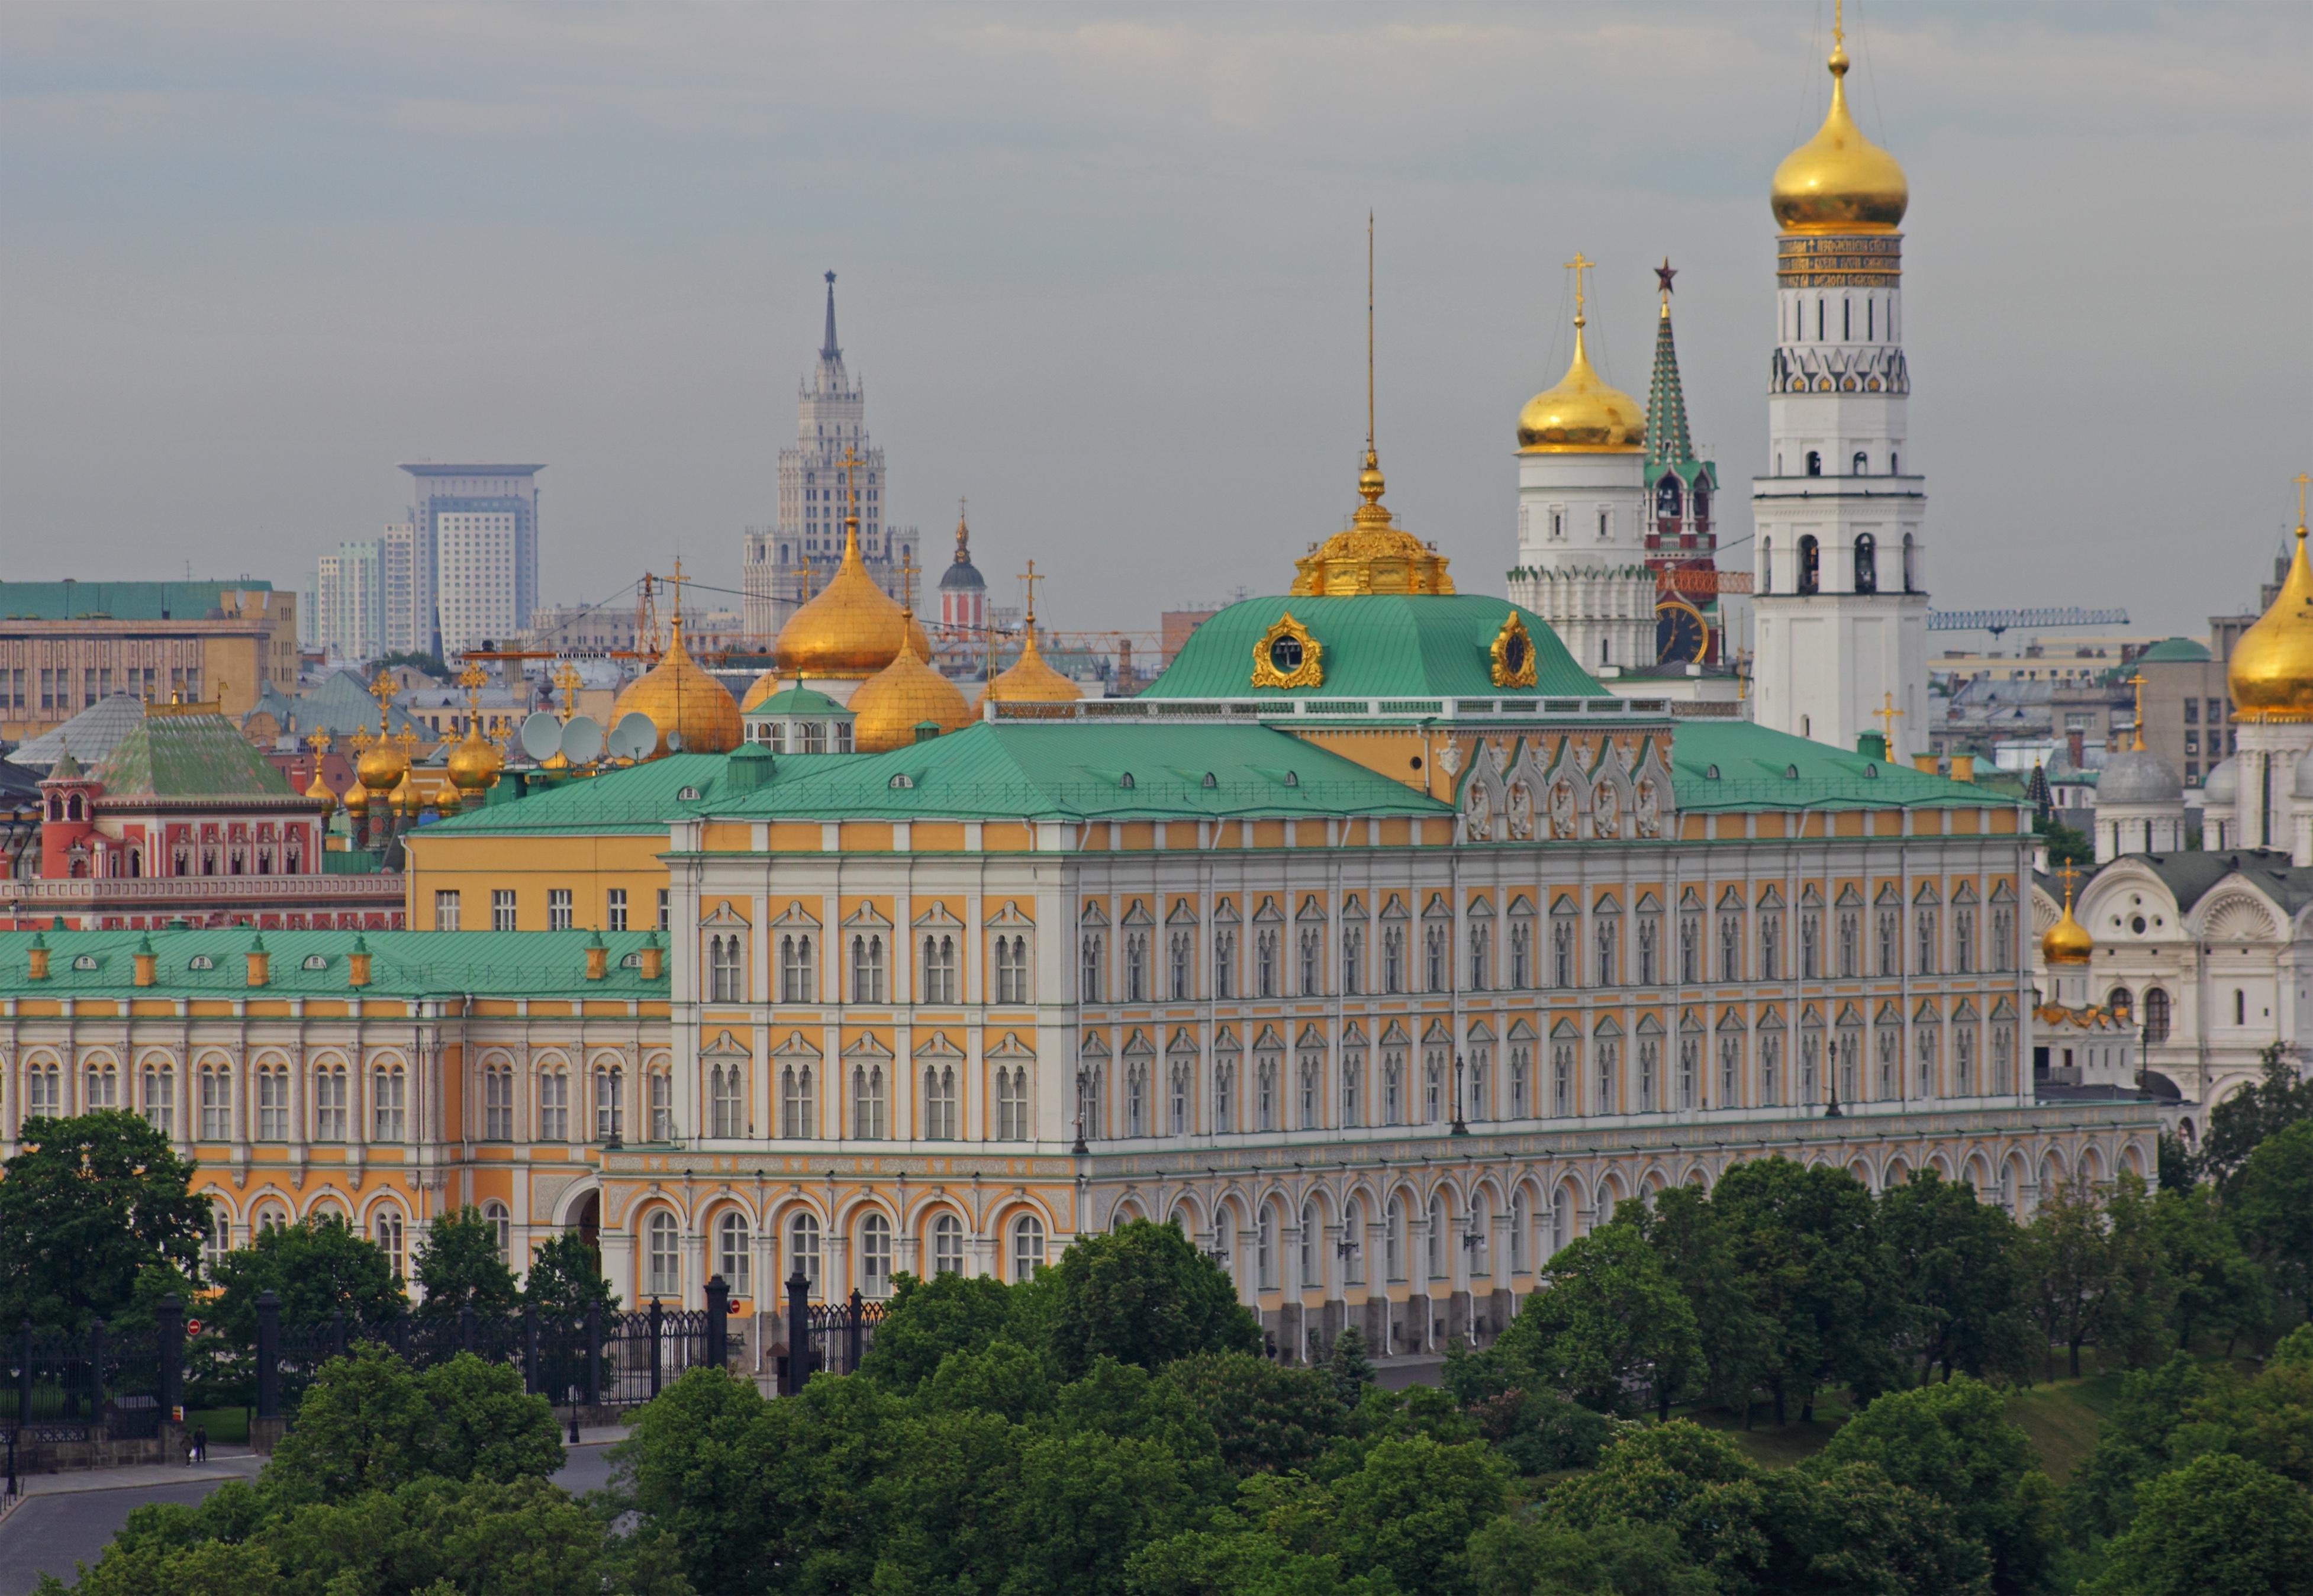 Moscow_05-2012_Kremlin_23